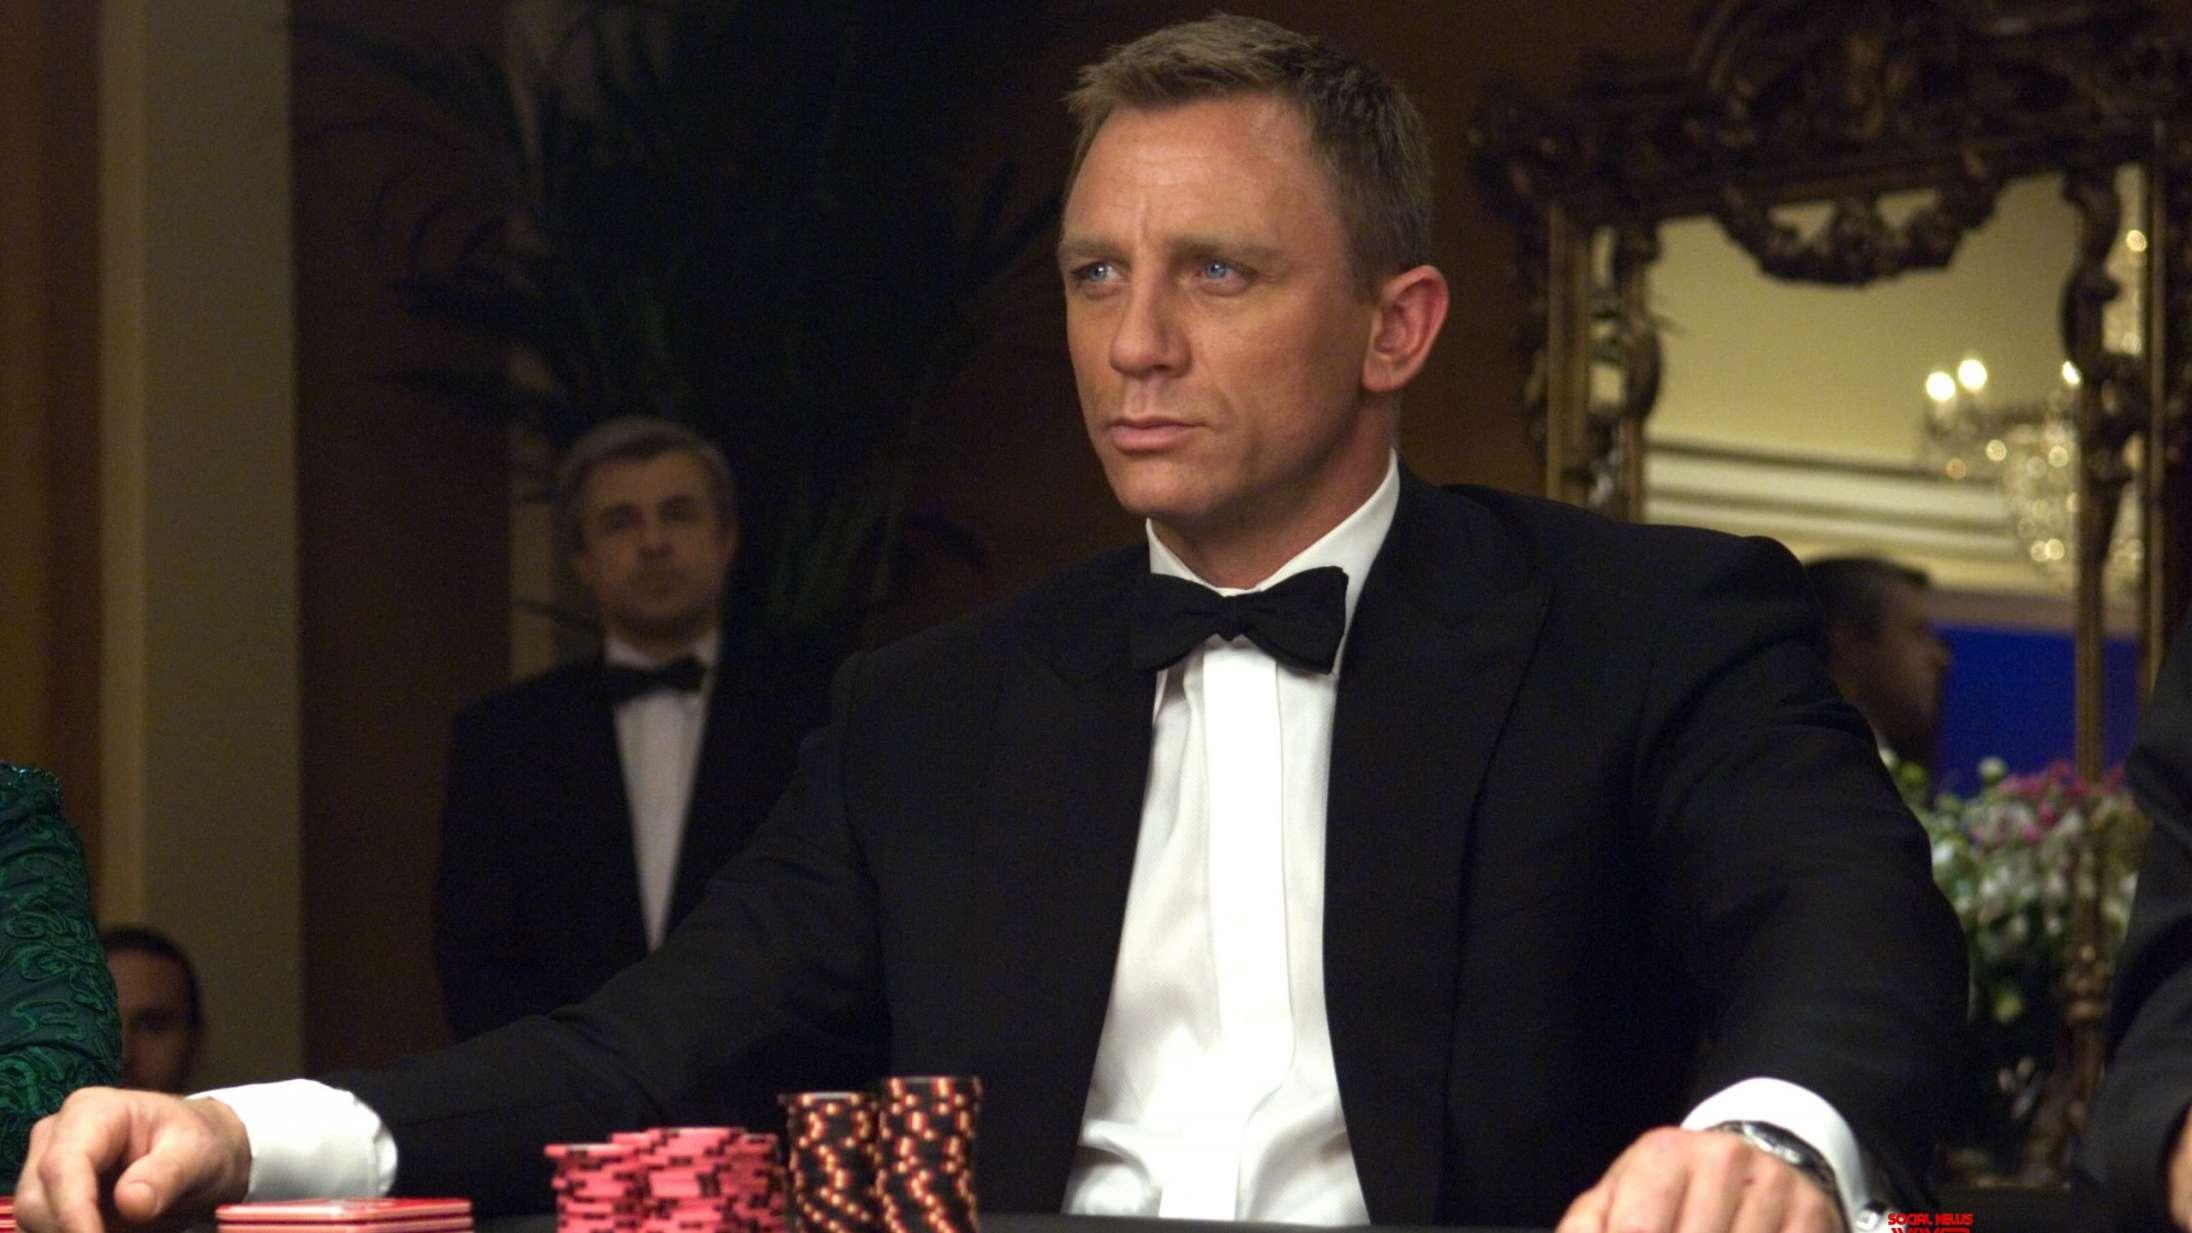 Lyt til podcasten Soundvenue Filmklub: 'Casino Royale' gjorde James Bond relevant igen – er han stadig det?